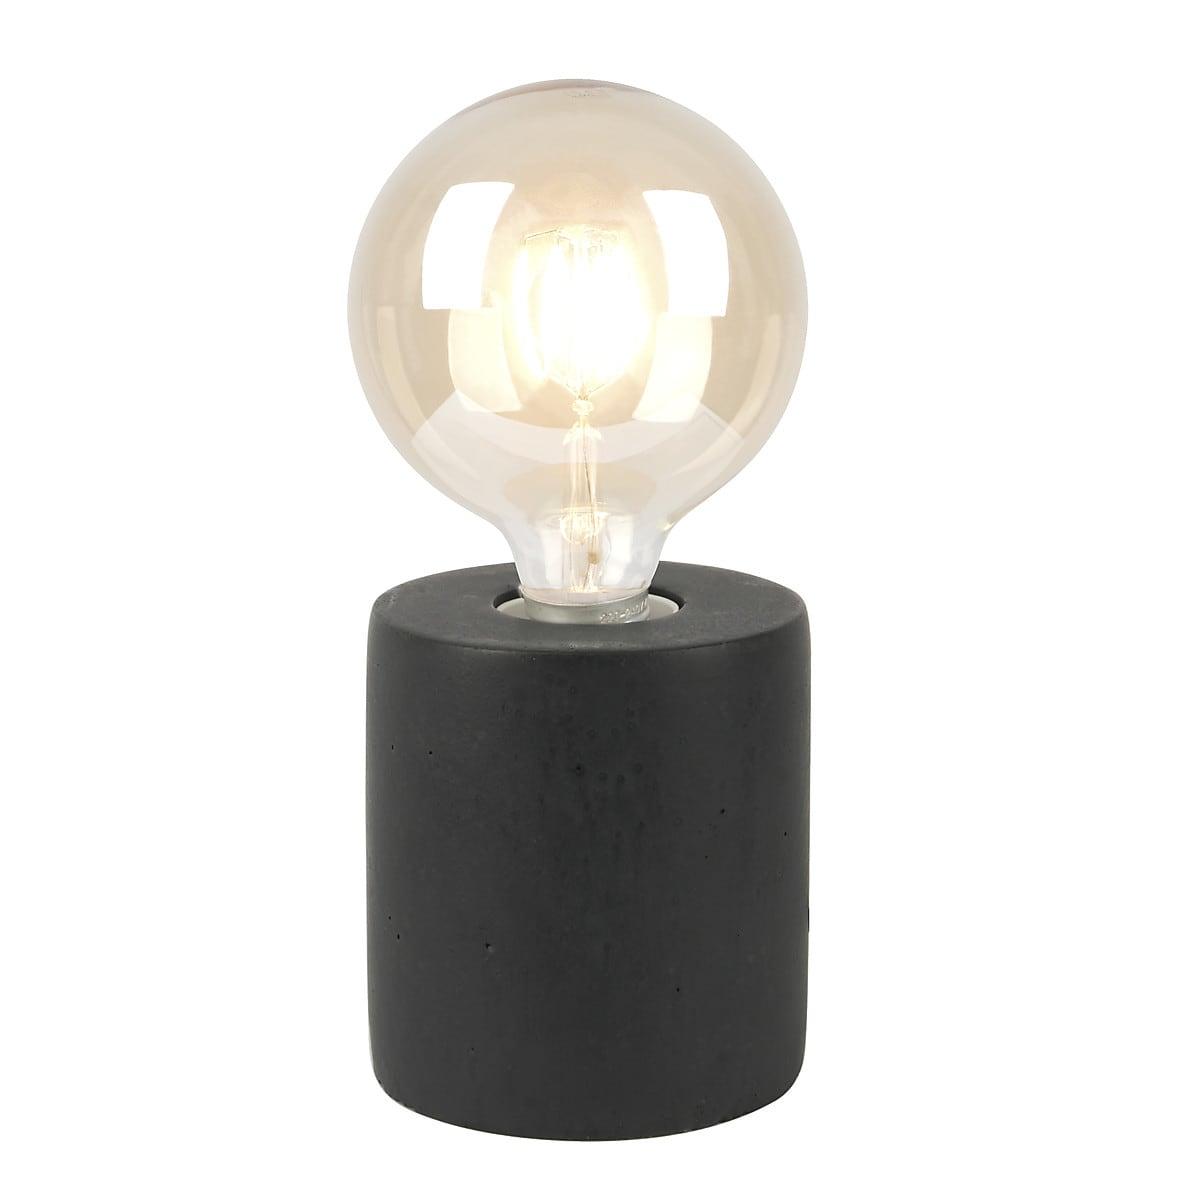 Tube Table Lamp